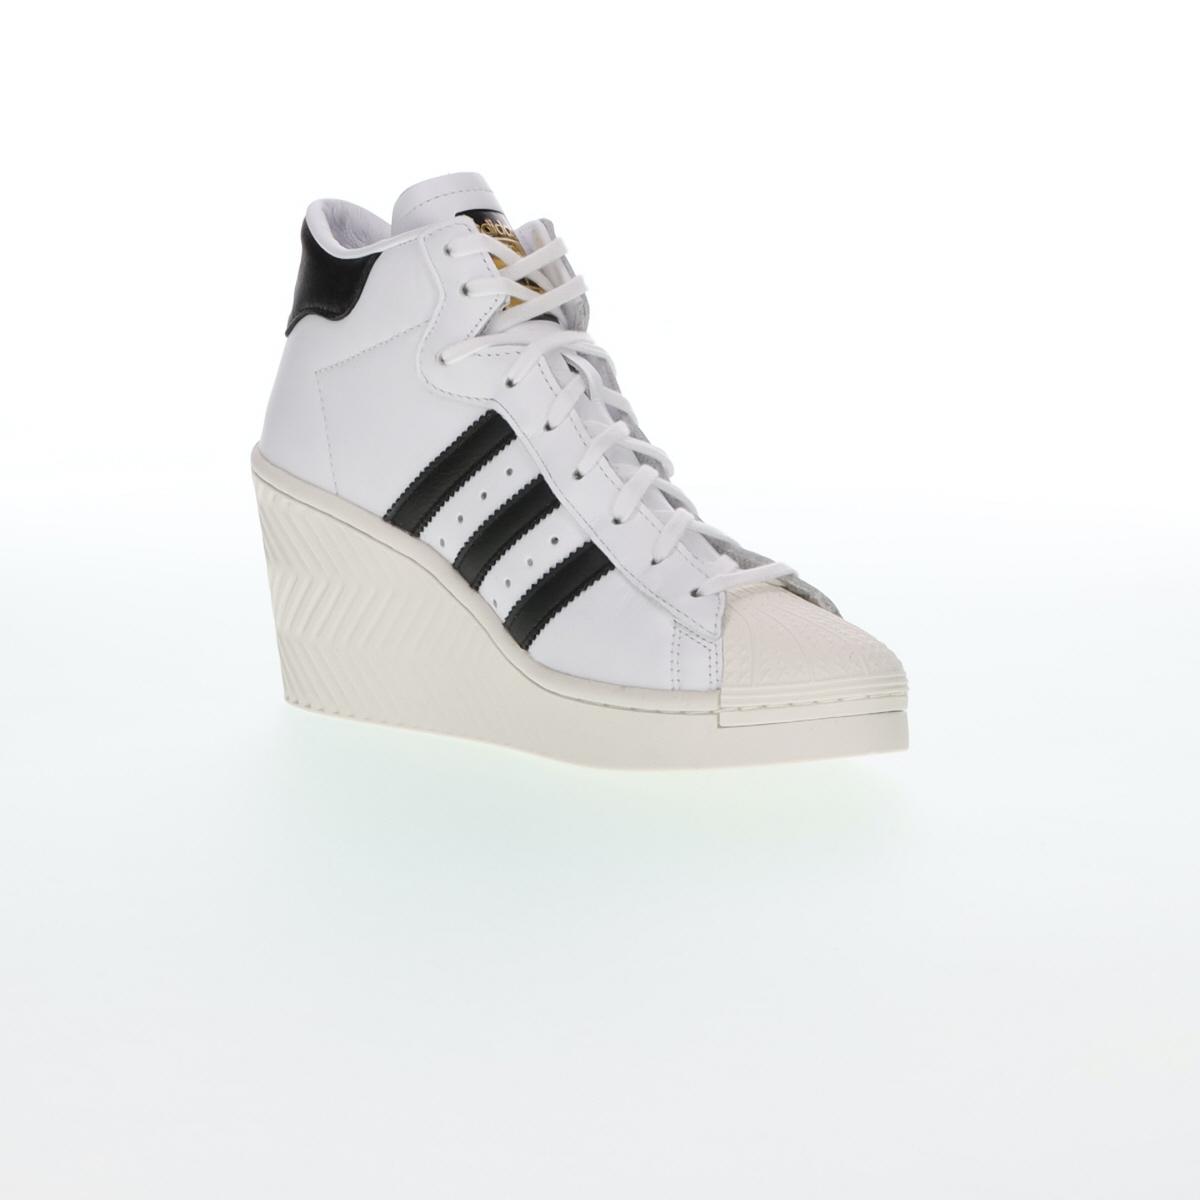 yeezy sweatpants dupe line shoes online